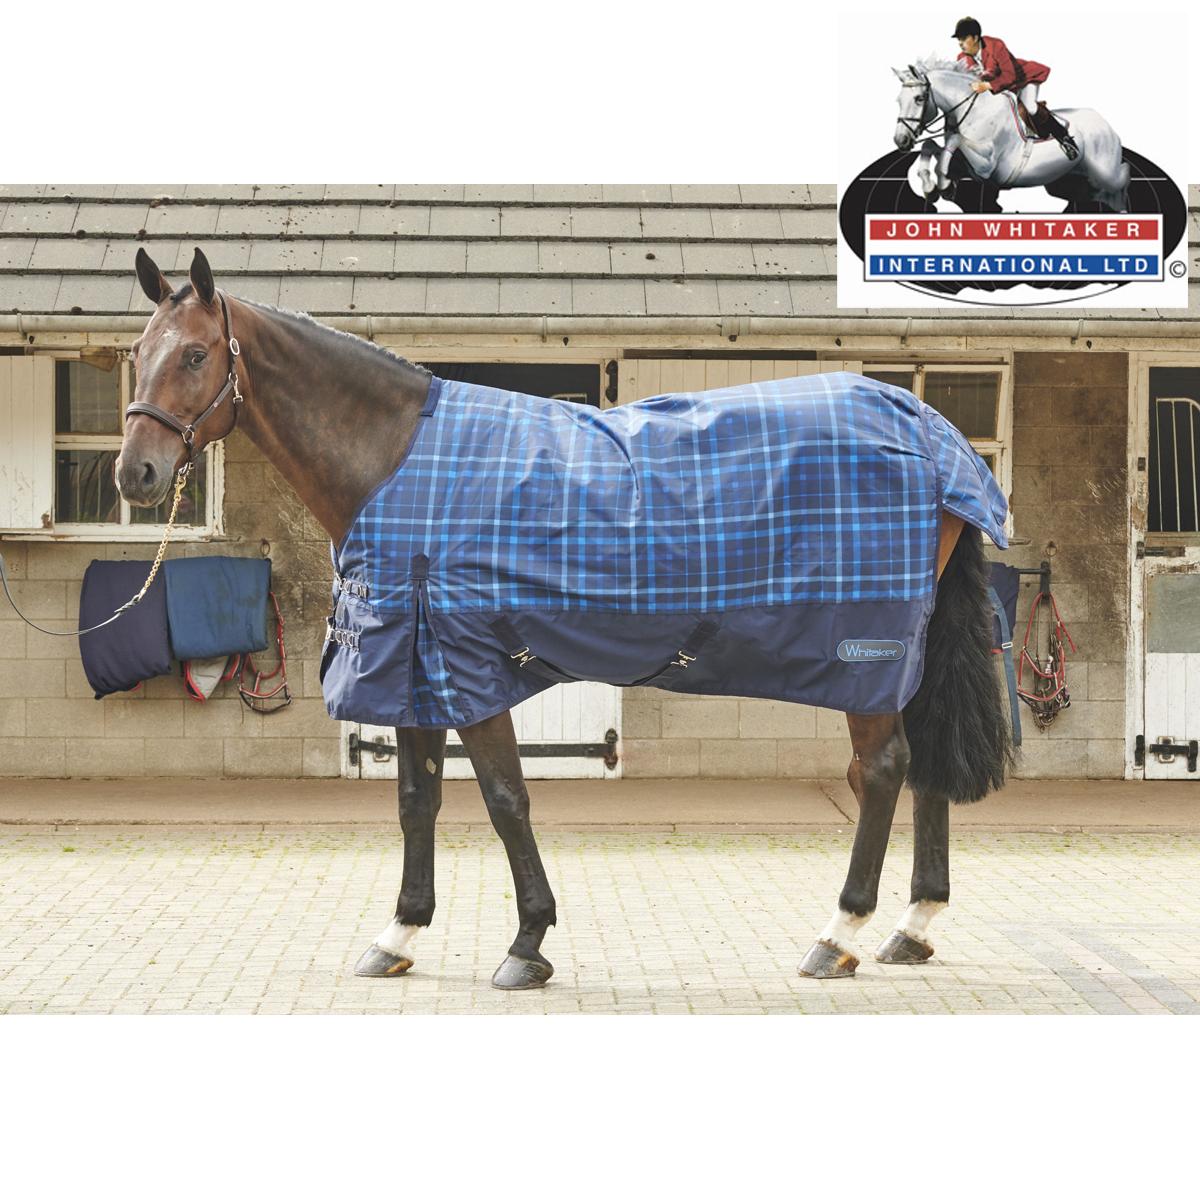 John Whitaker menston Medium 200g Cavallo Affluenza Alle Urne Tappeto V3  vendita   GRATIS UK SHIPPI